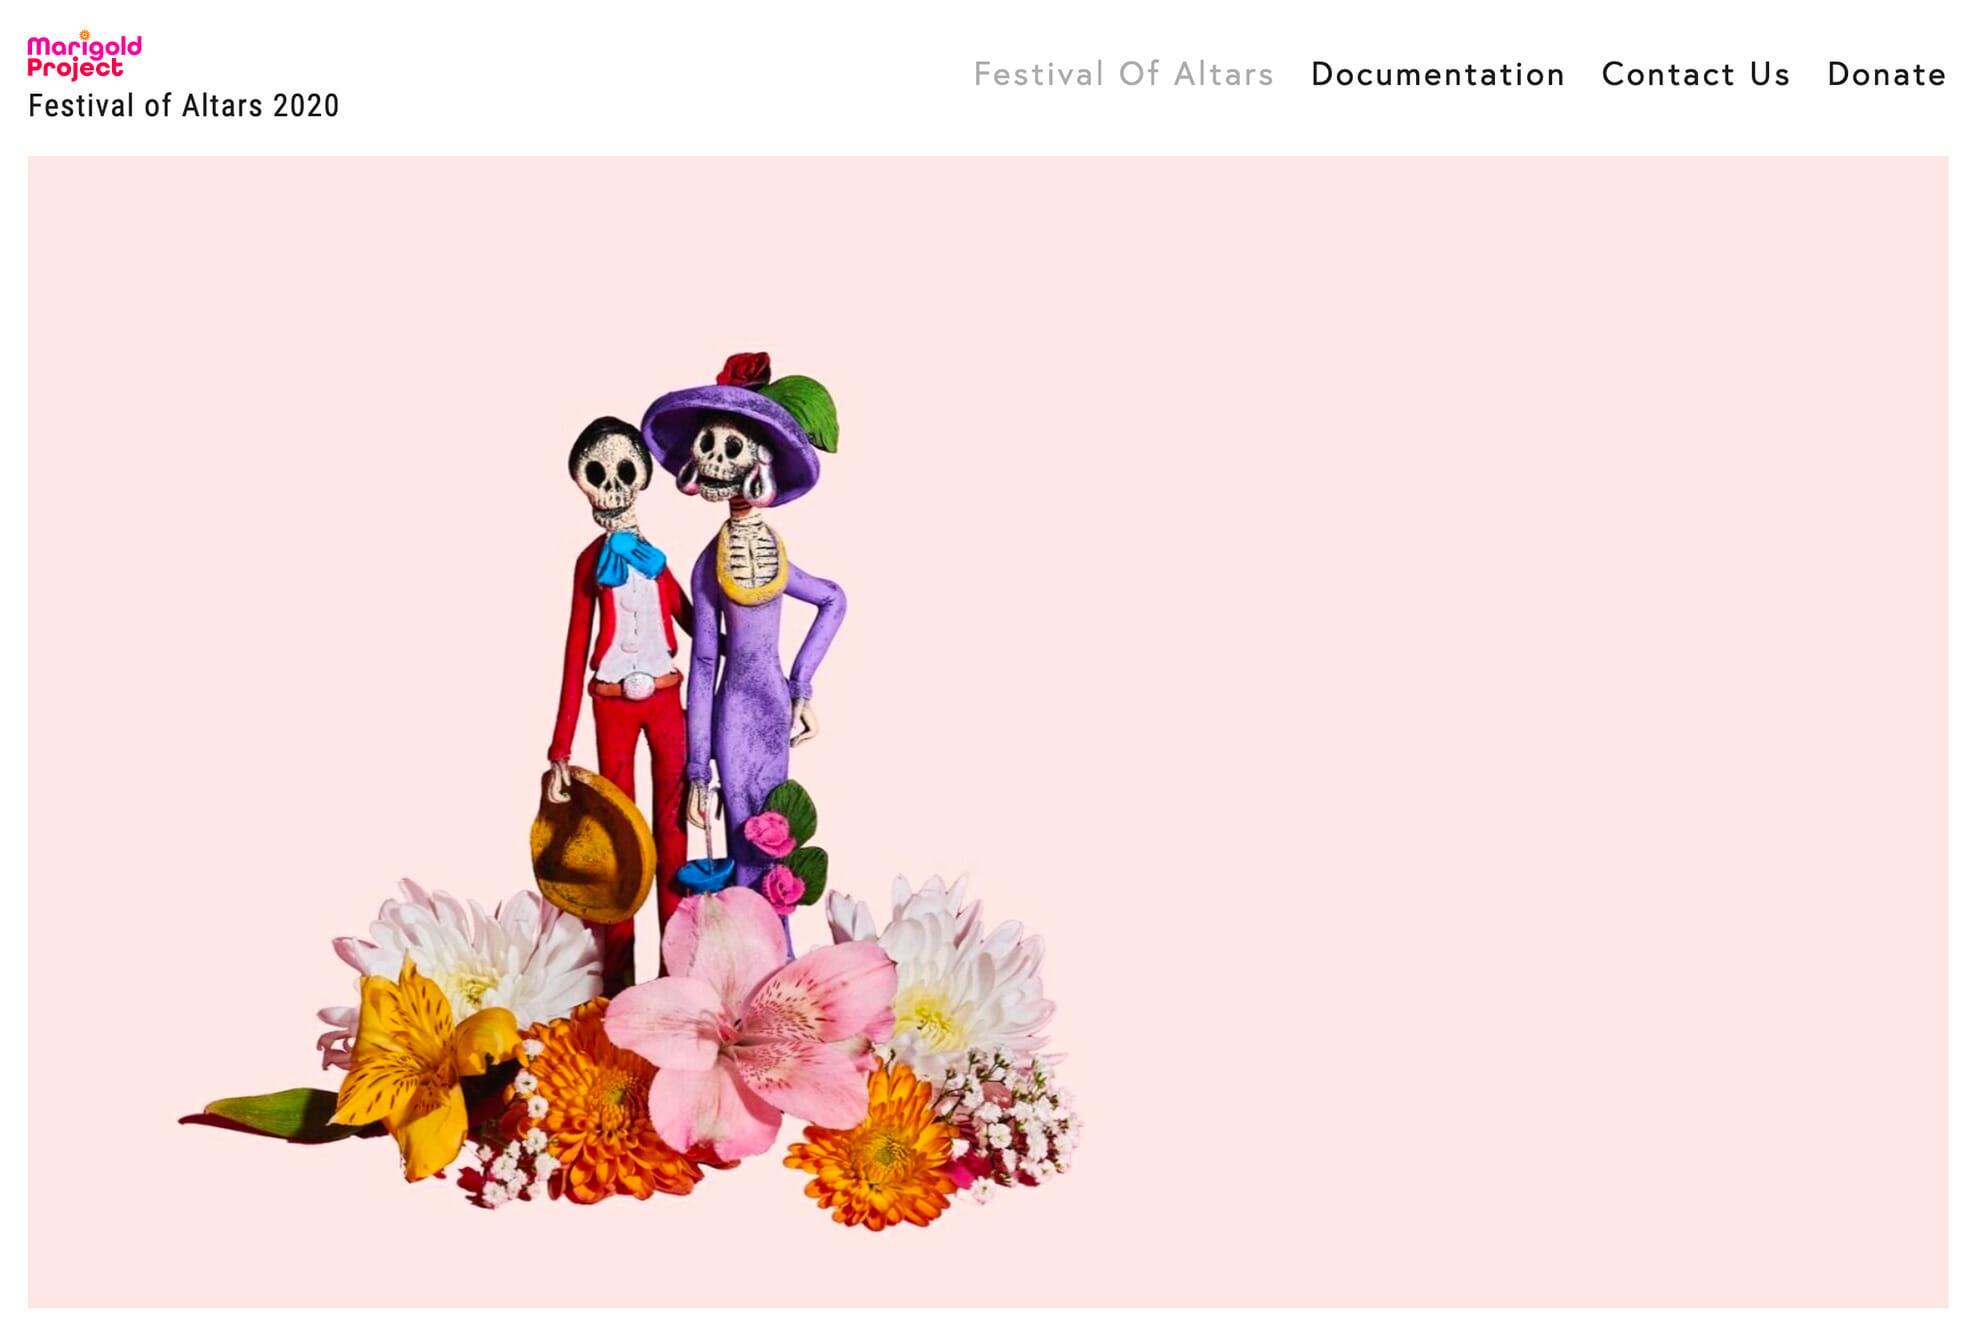 Marigold Project Festival of Altars 2020 website